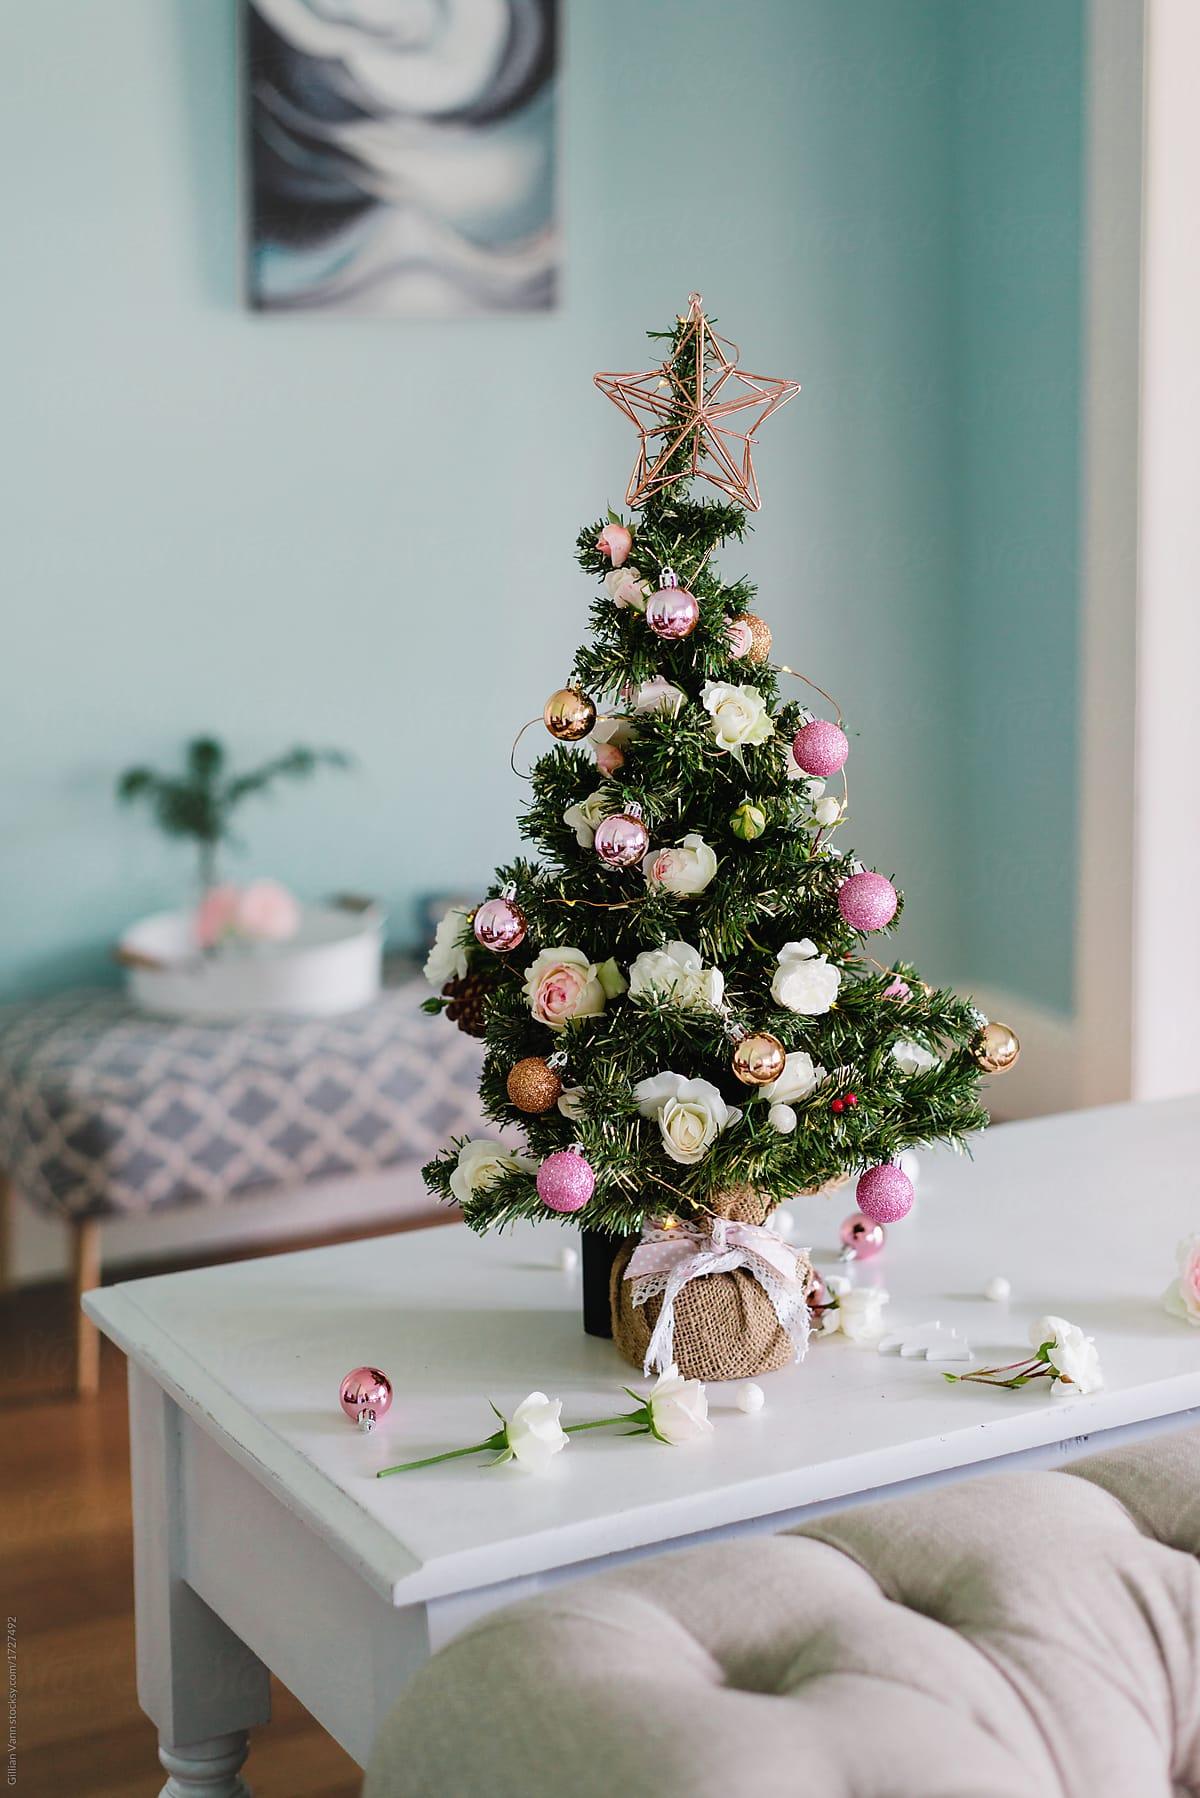 Small xmas tree on sofa tablein living room stocksy united - Where to put christmas tree in small living room ...